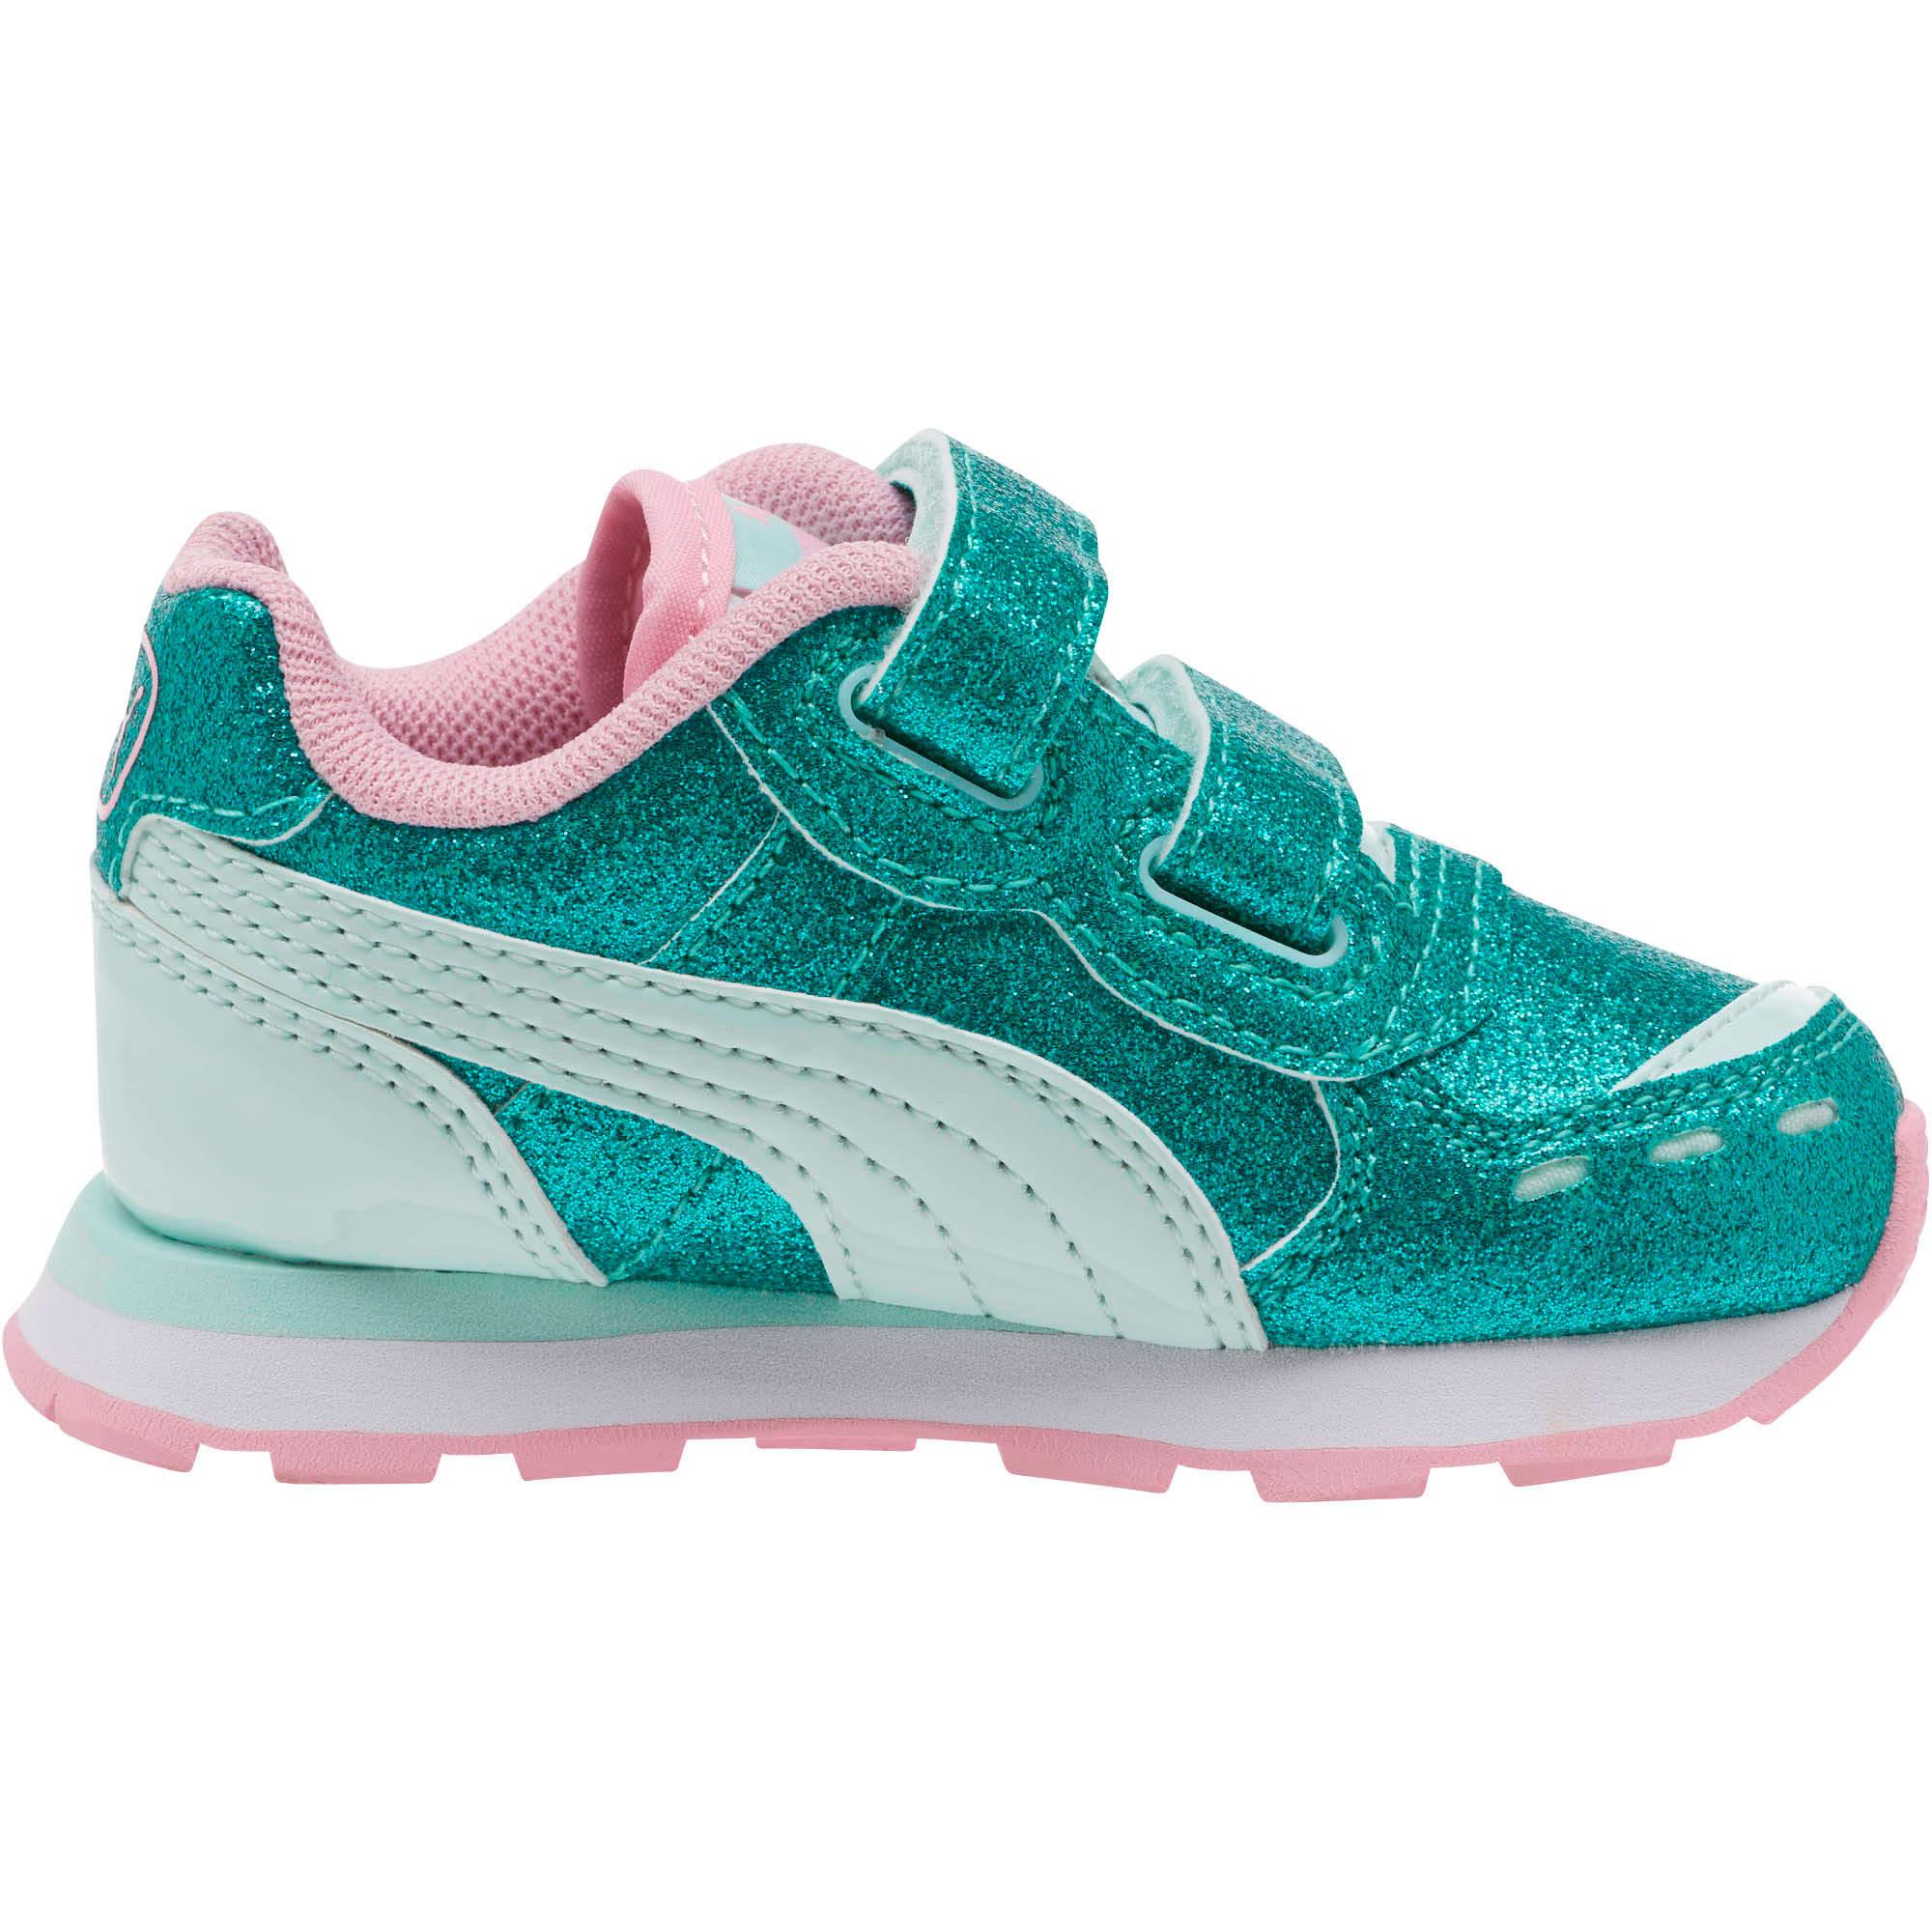 Thumbnail 3 of Vista Glitz Toddler Shoes, Fair Aqua-Pale Pink, medium